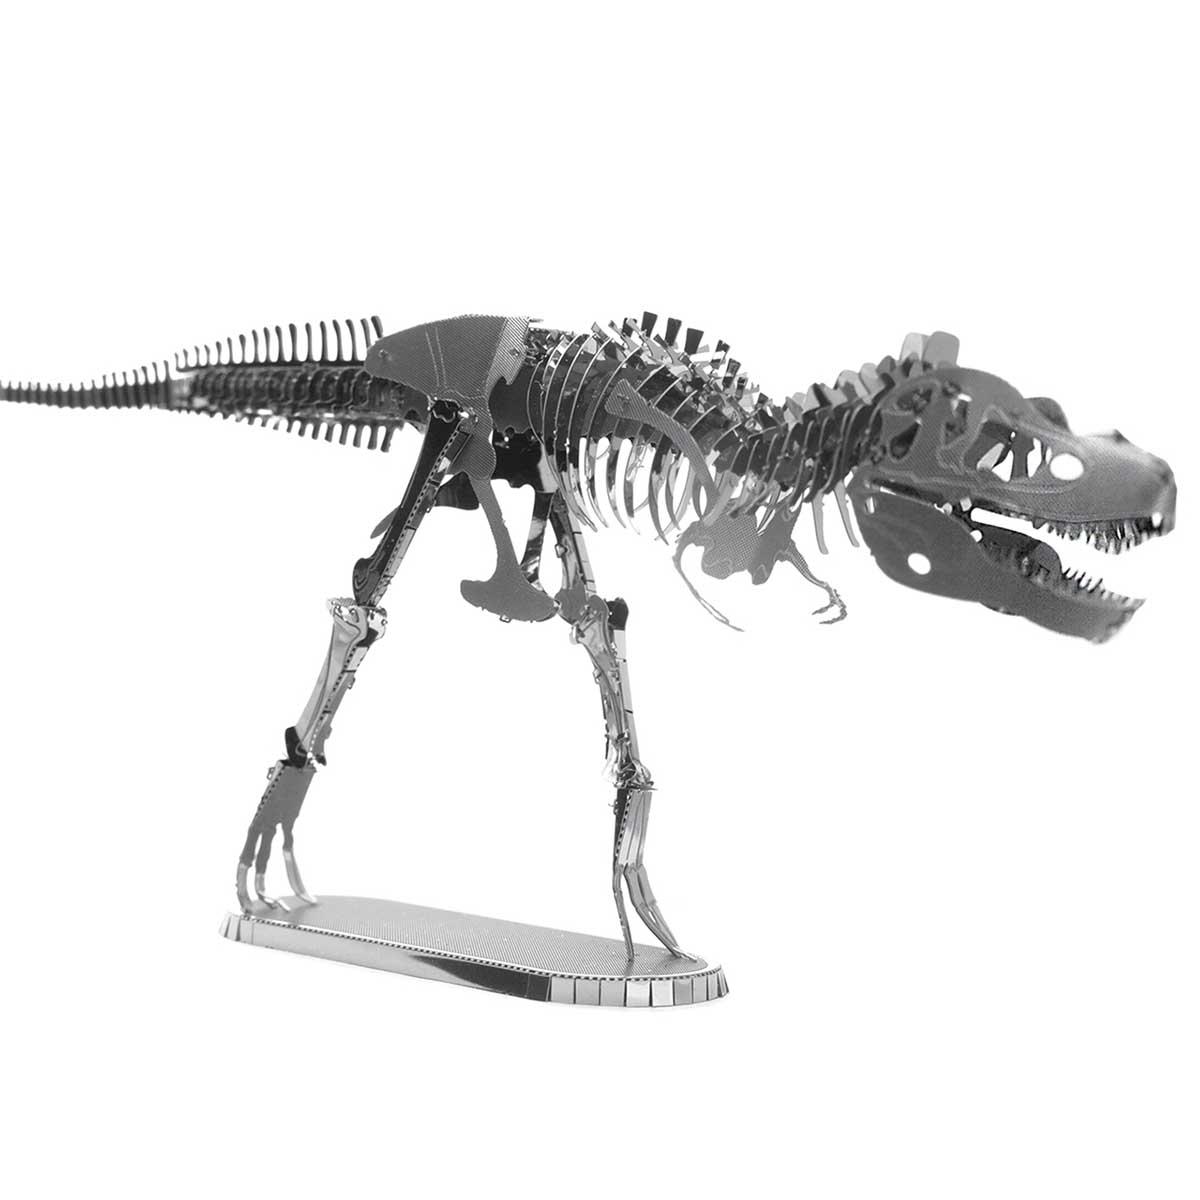 Tyrannosaurus Rex Skeleton Dinosaurs 3D Puzzle